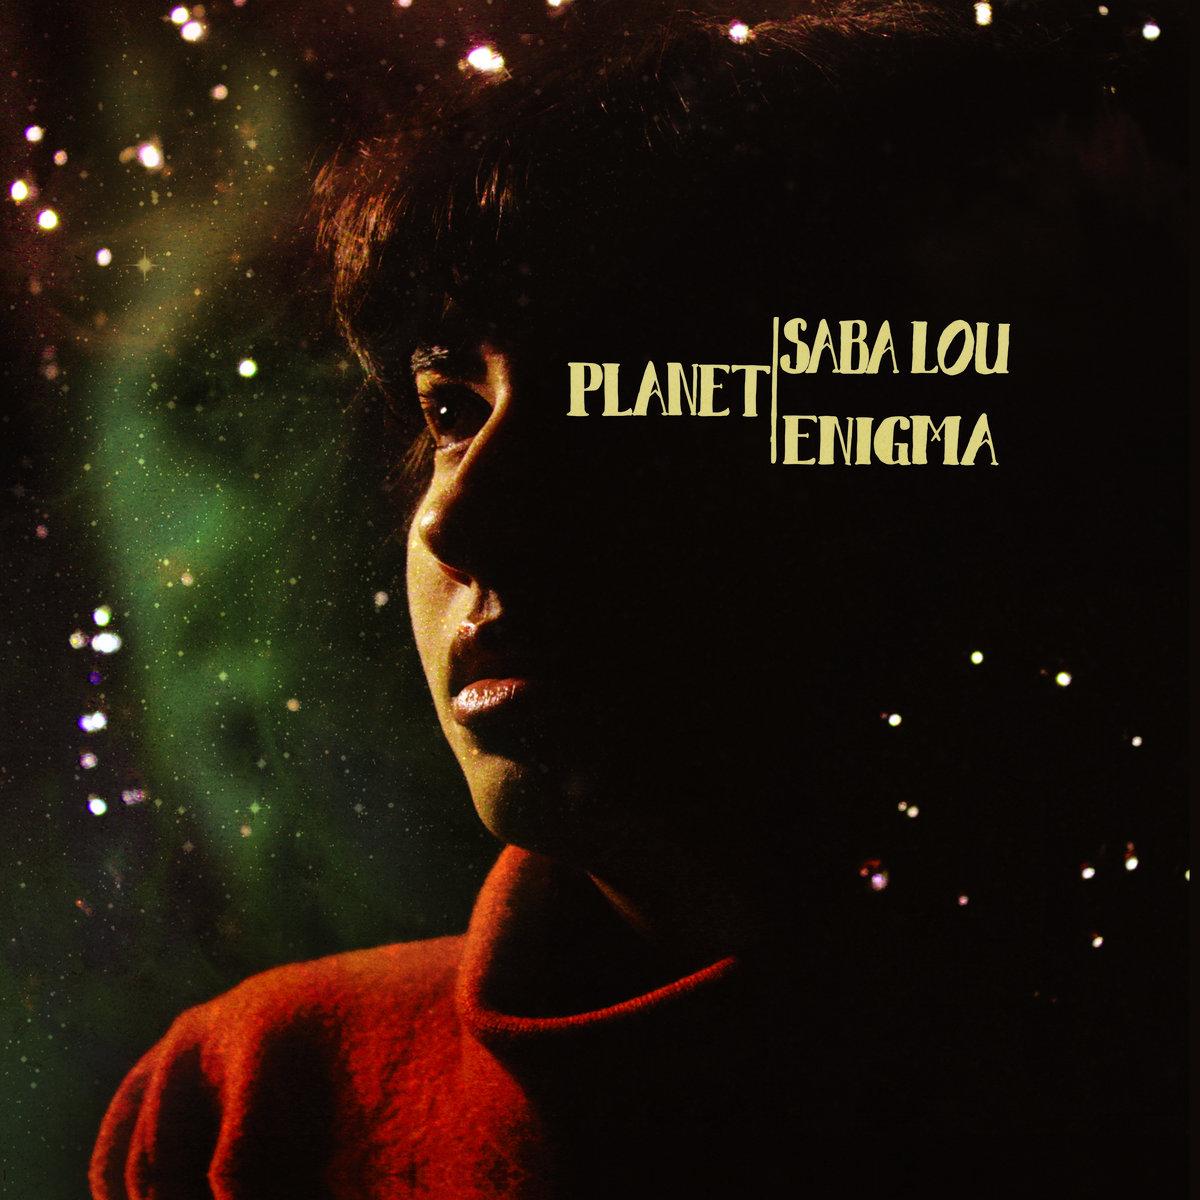 Saba Lou - Planet Enigma